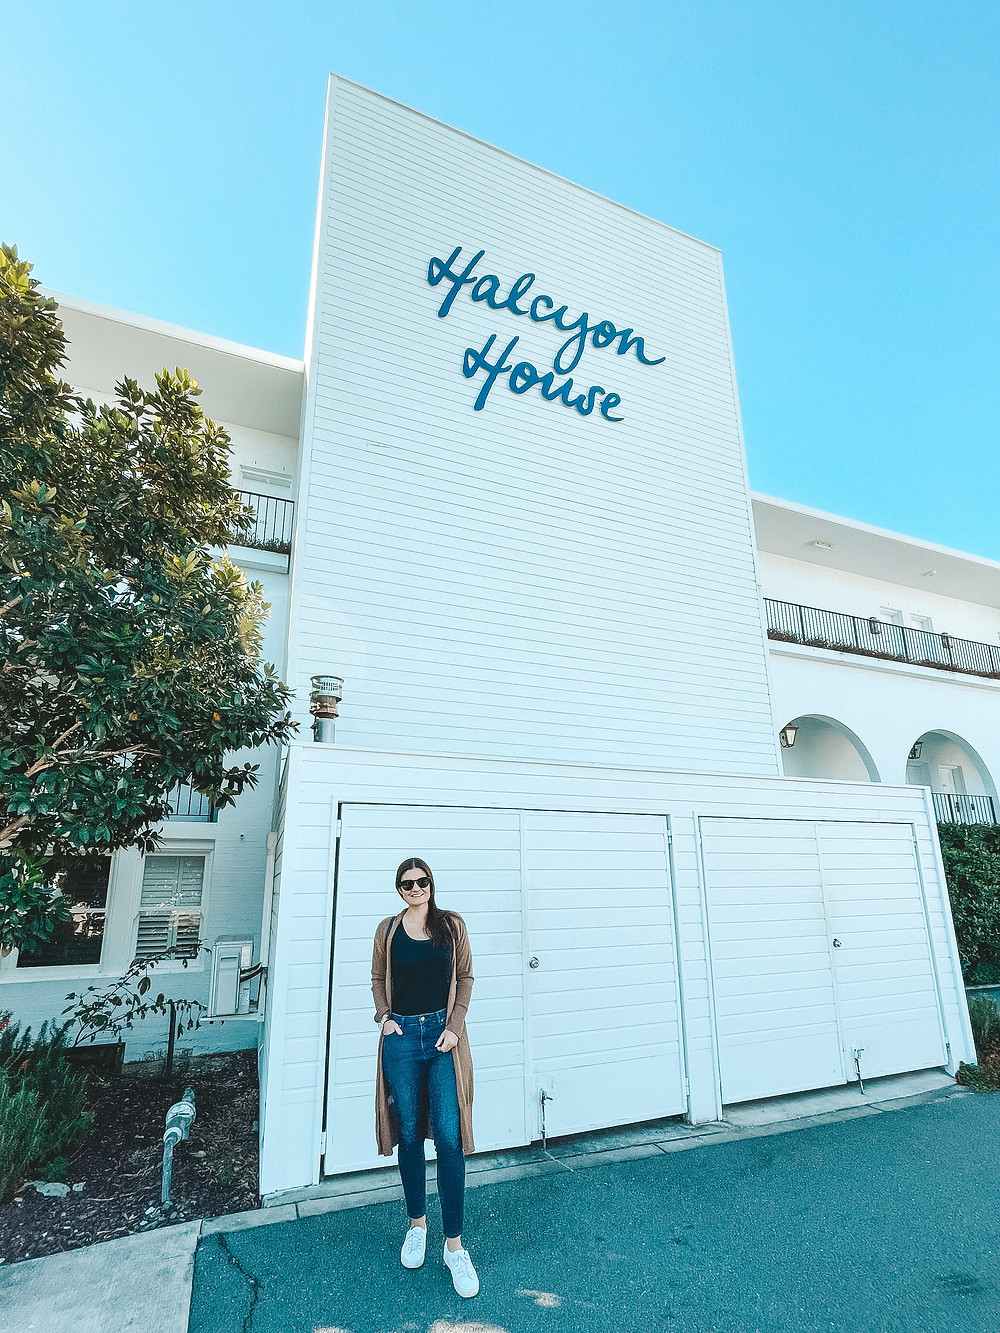 Halcyon House Boutique Hotel, Cabarita Beach, NSW